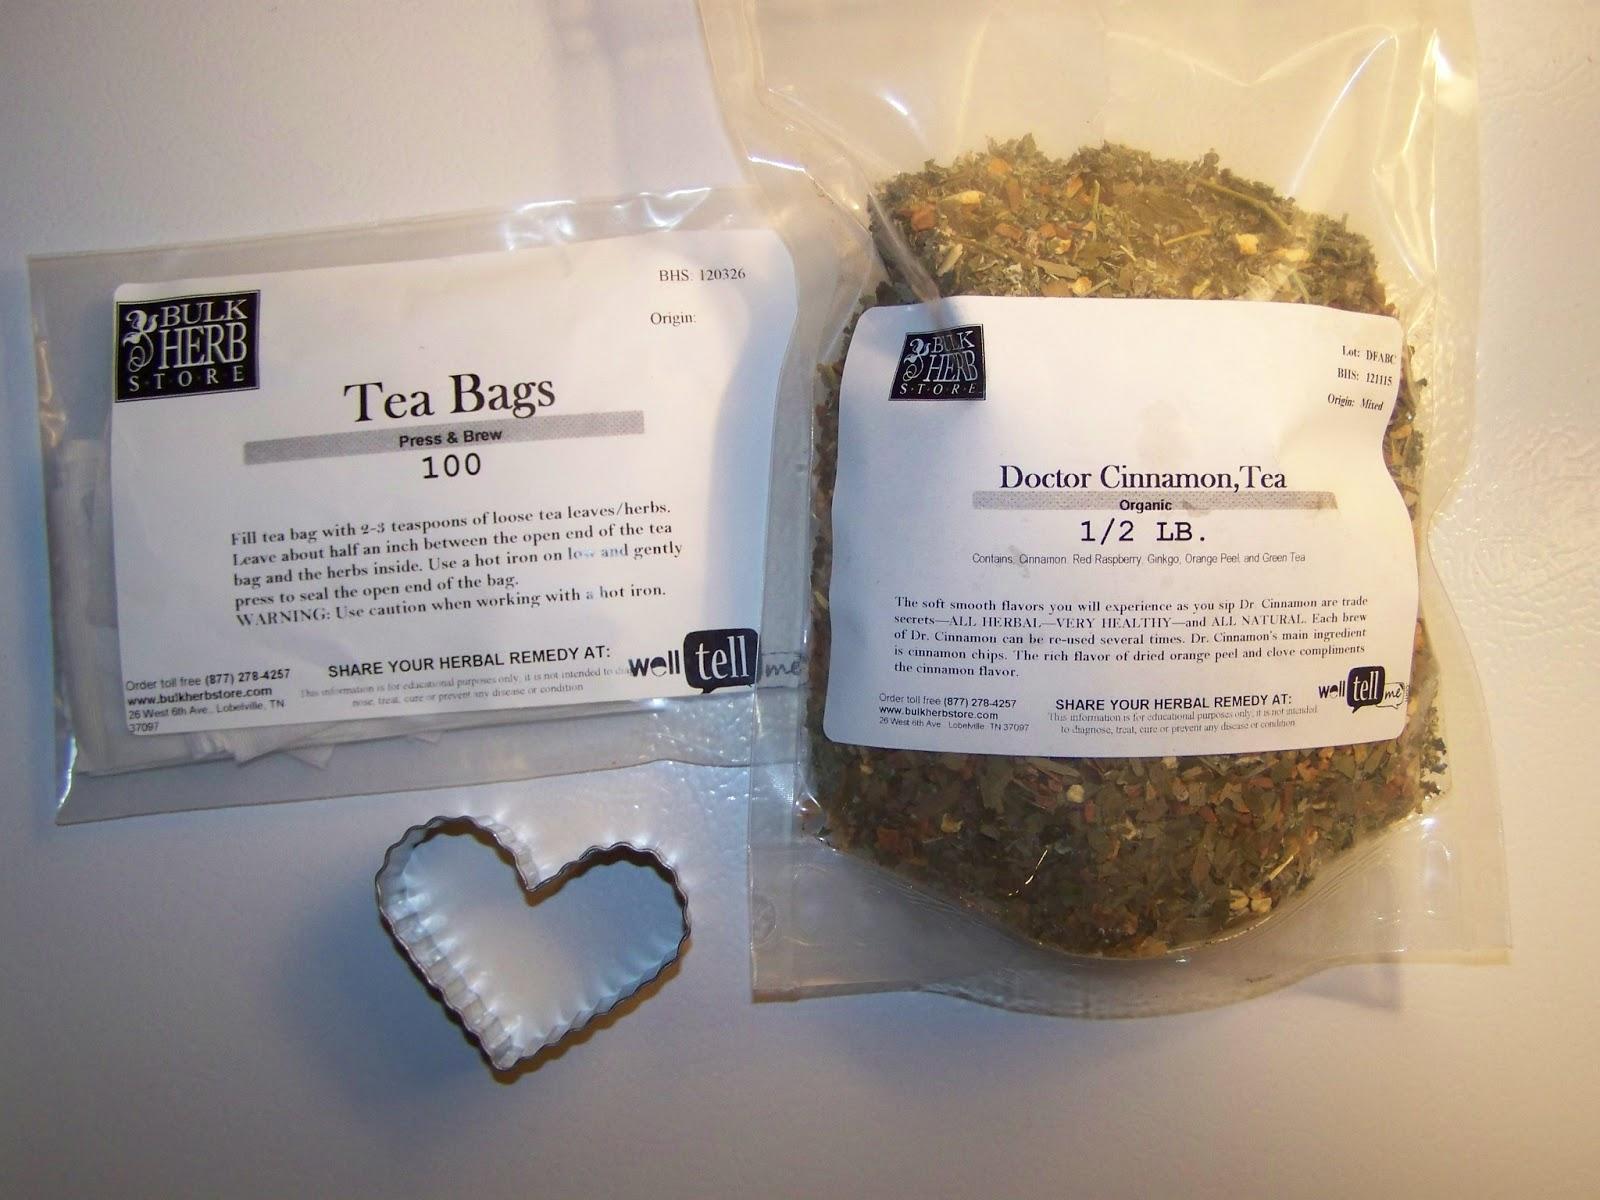 Bulk herbs spices organic organic herbal tea - Bulk Herbs Spices Organic Organic Herbal Tea 76